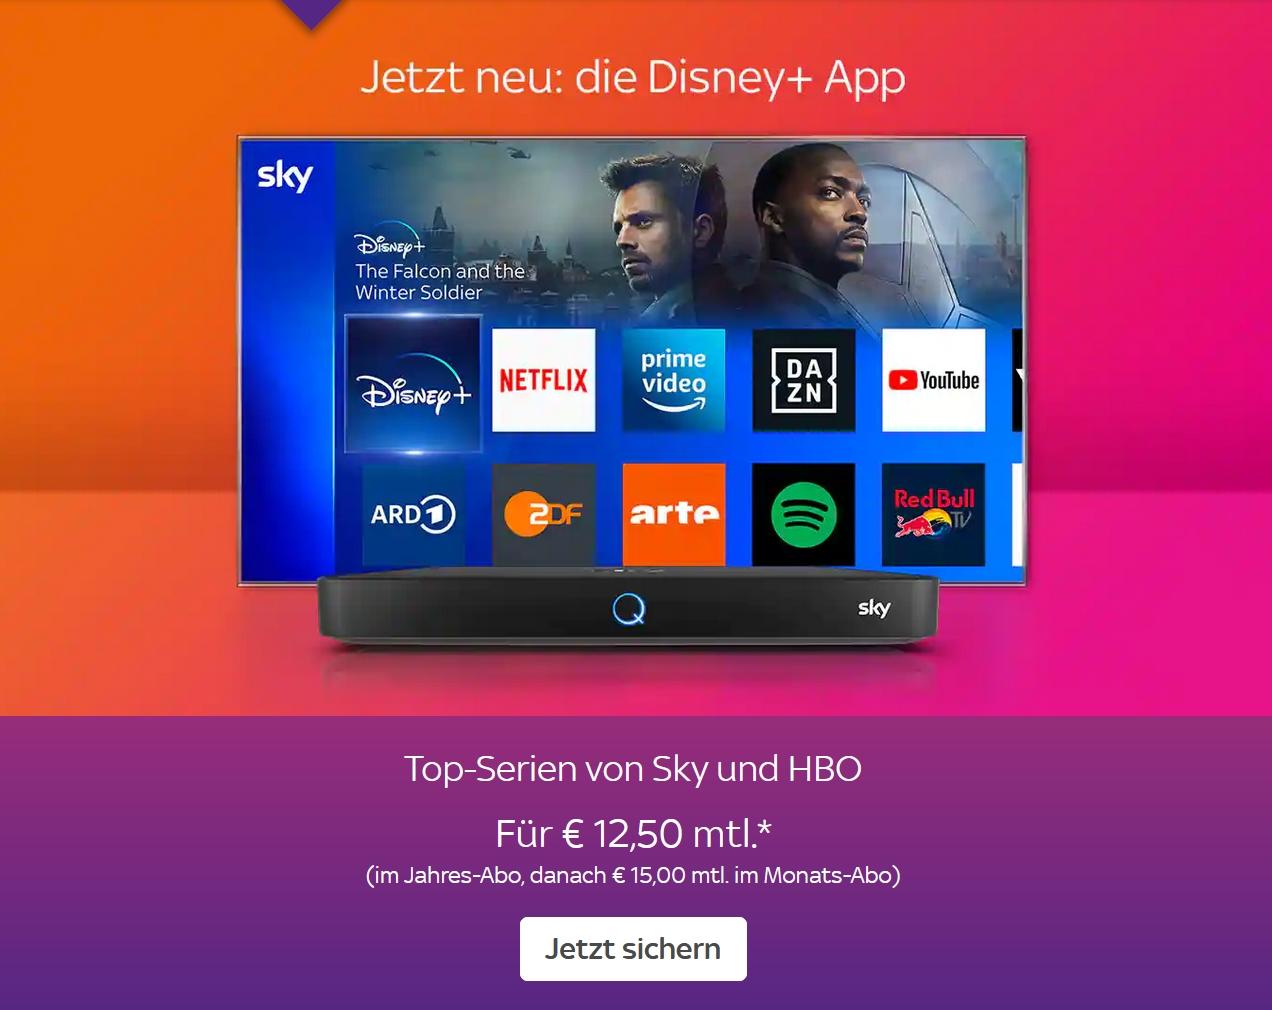 Sky Pakete im Angebot jetzt ab 12,50€/Monat inkl. Sky Q und HD!